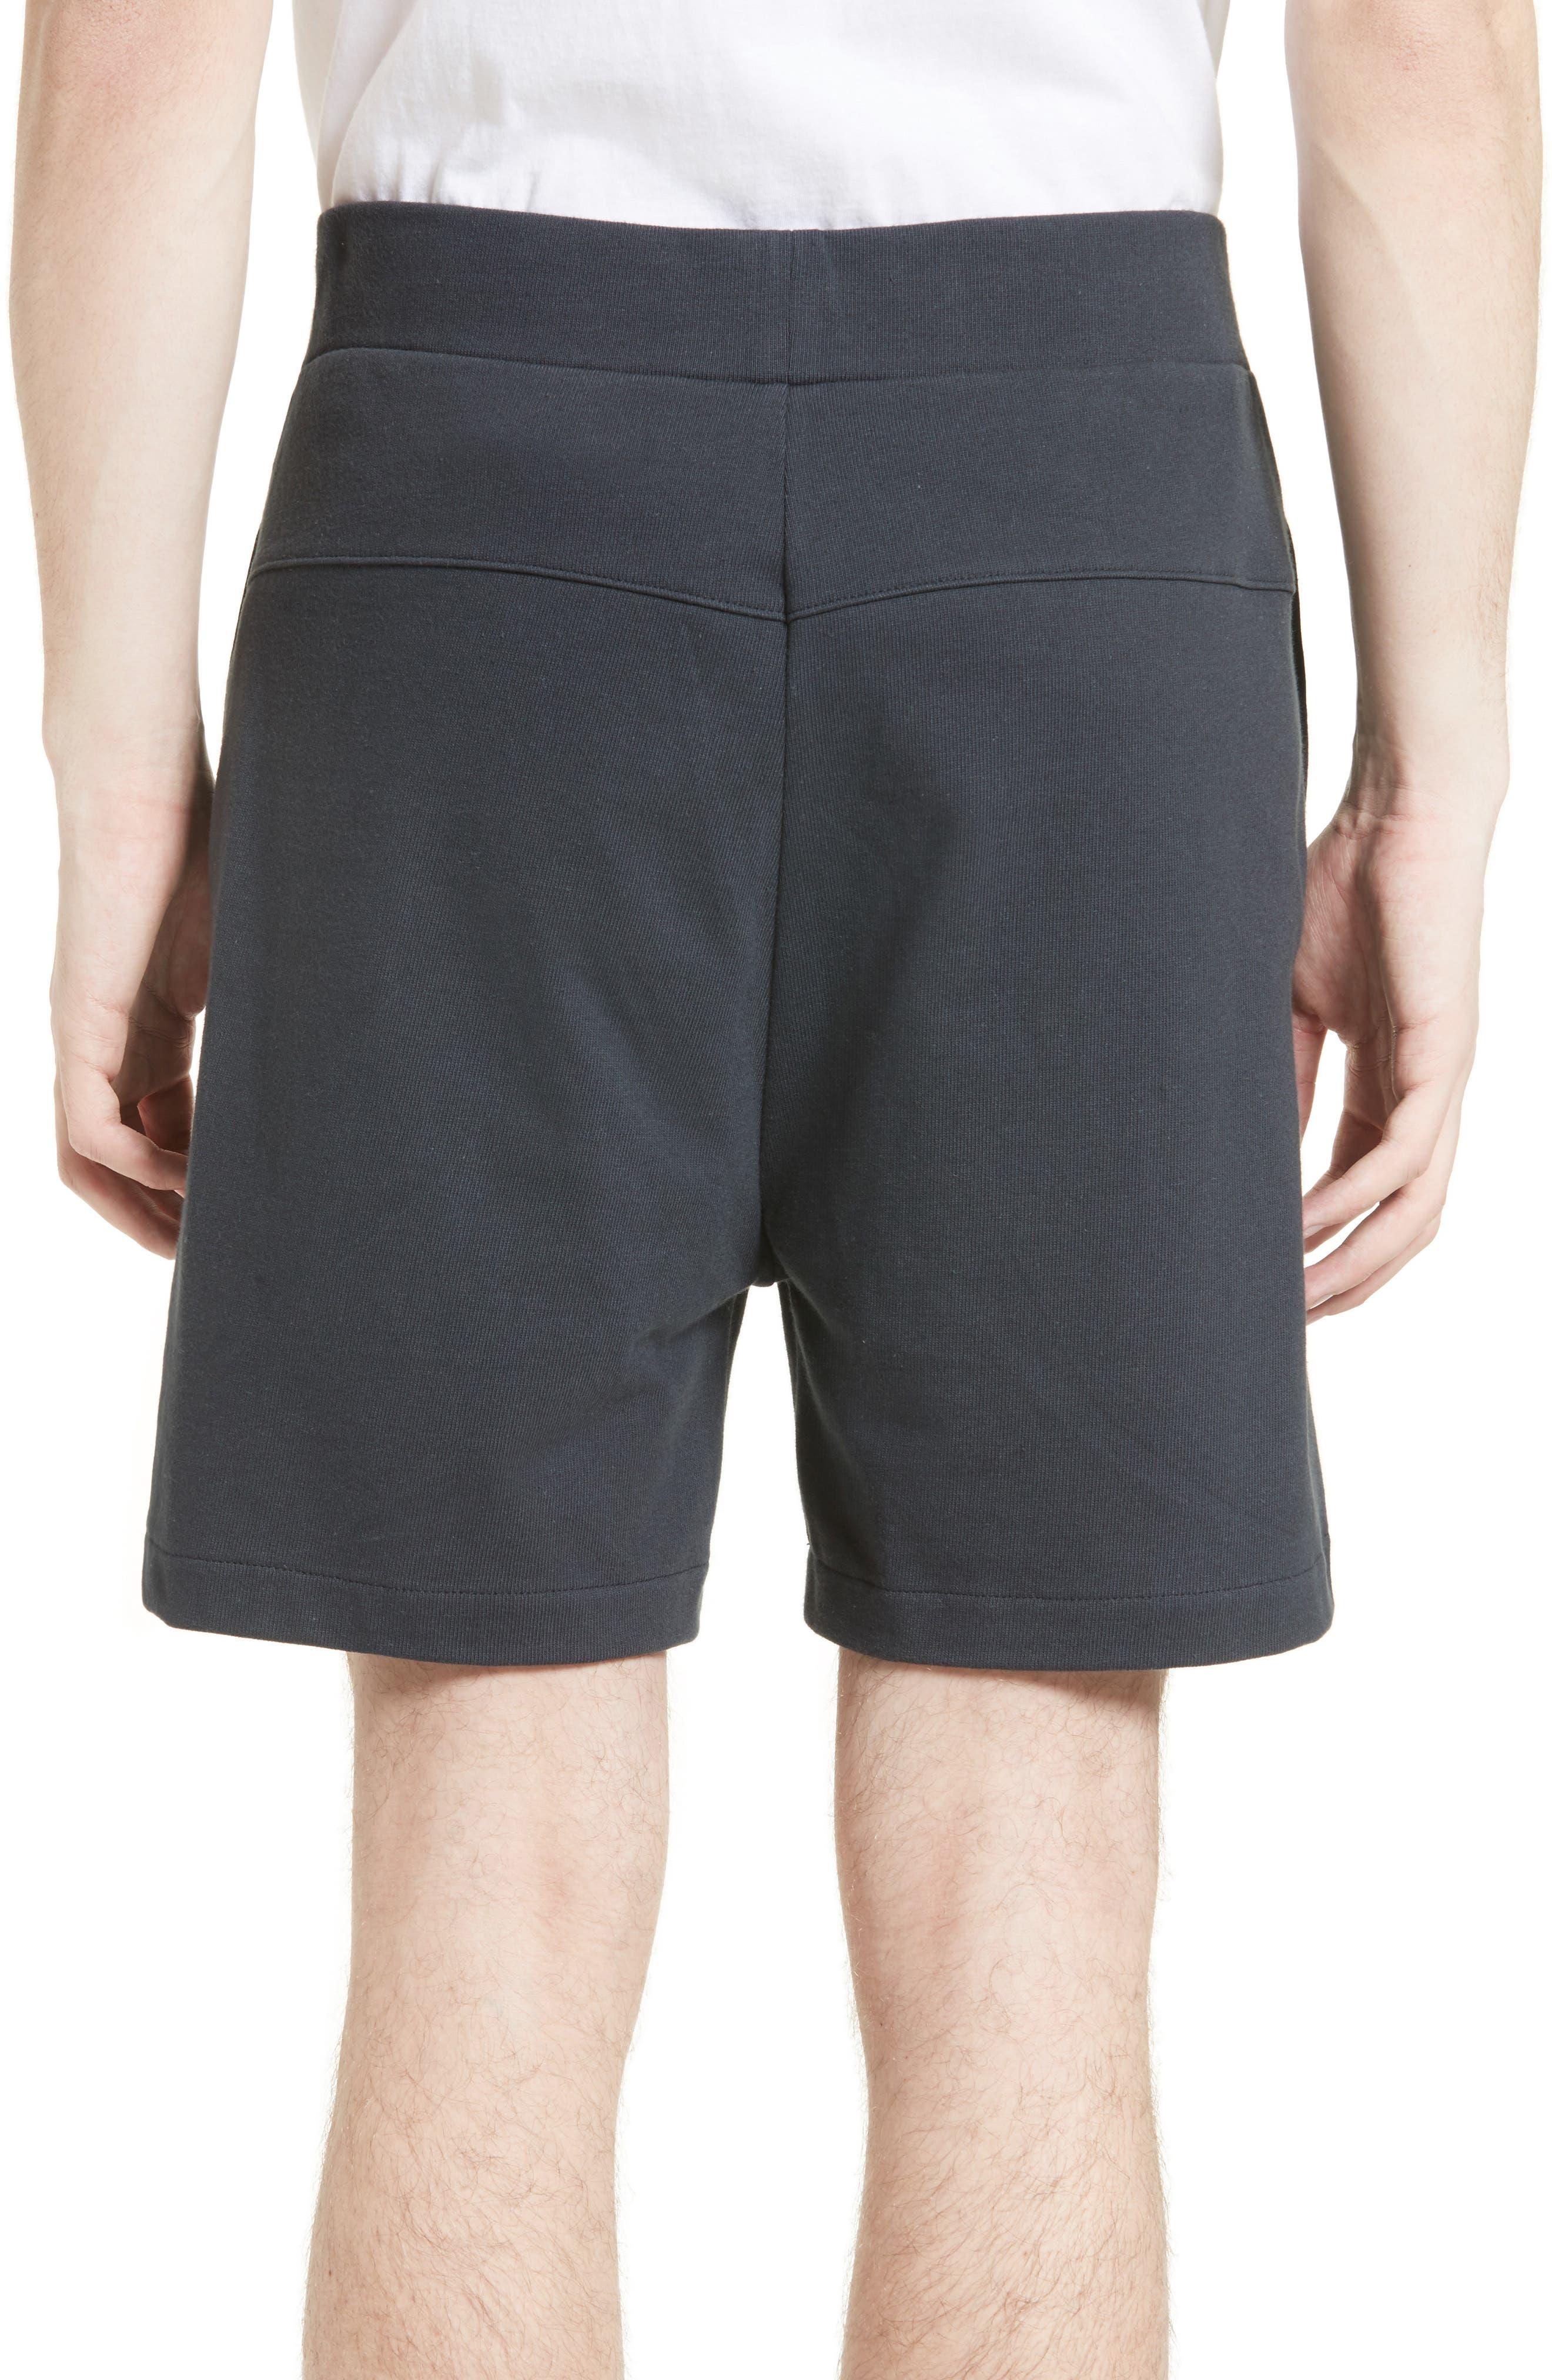 Green Park Jersey Shorts,                             Alternate thumbnail 2, color,                             020